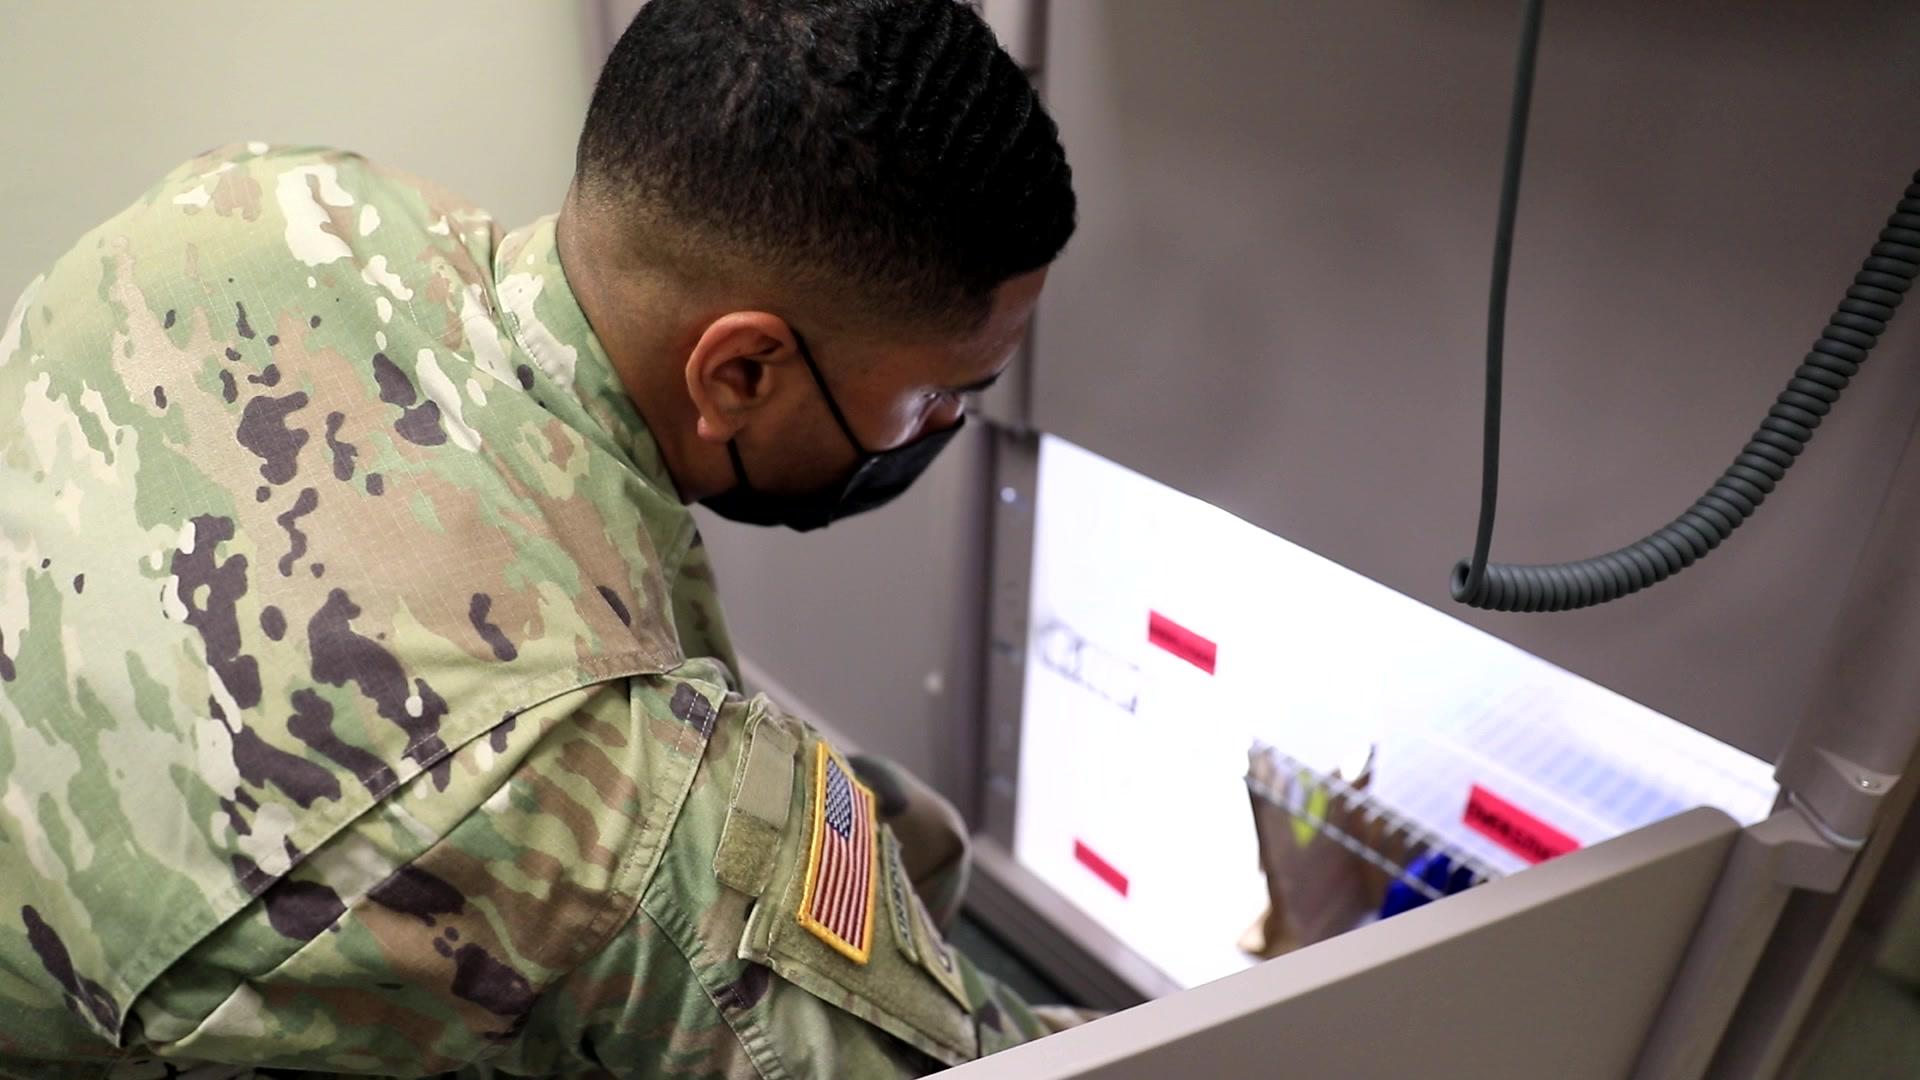 Soldier Story: U.S. Army Spc. Siary Williamson